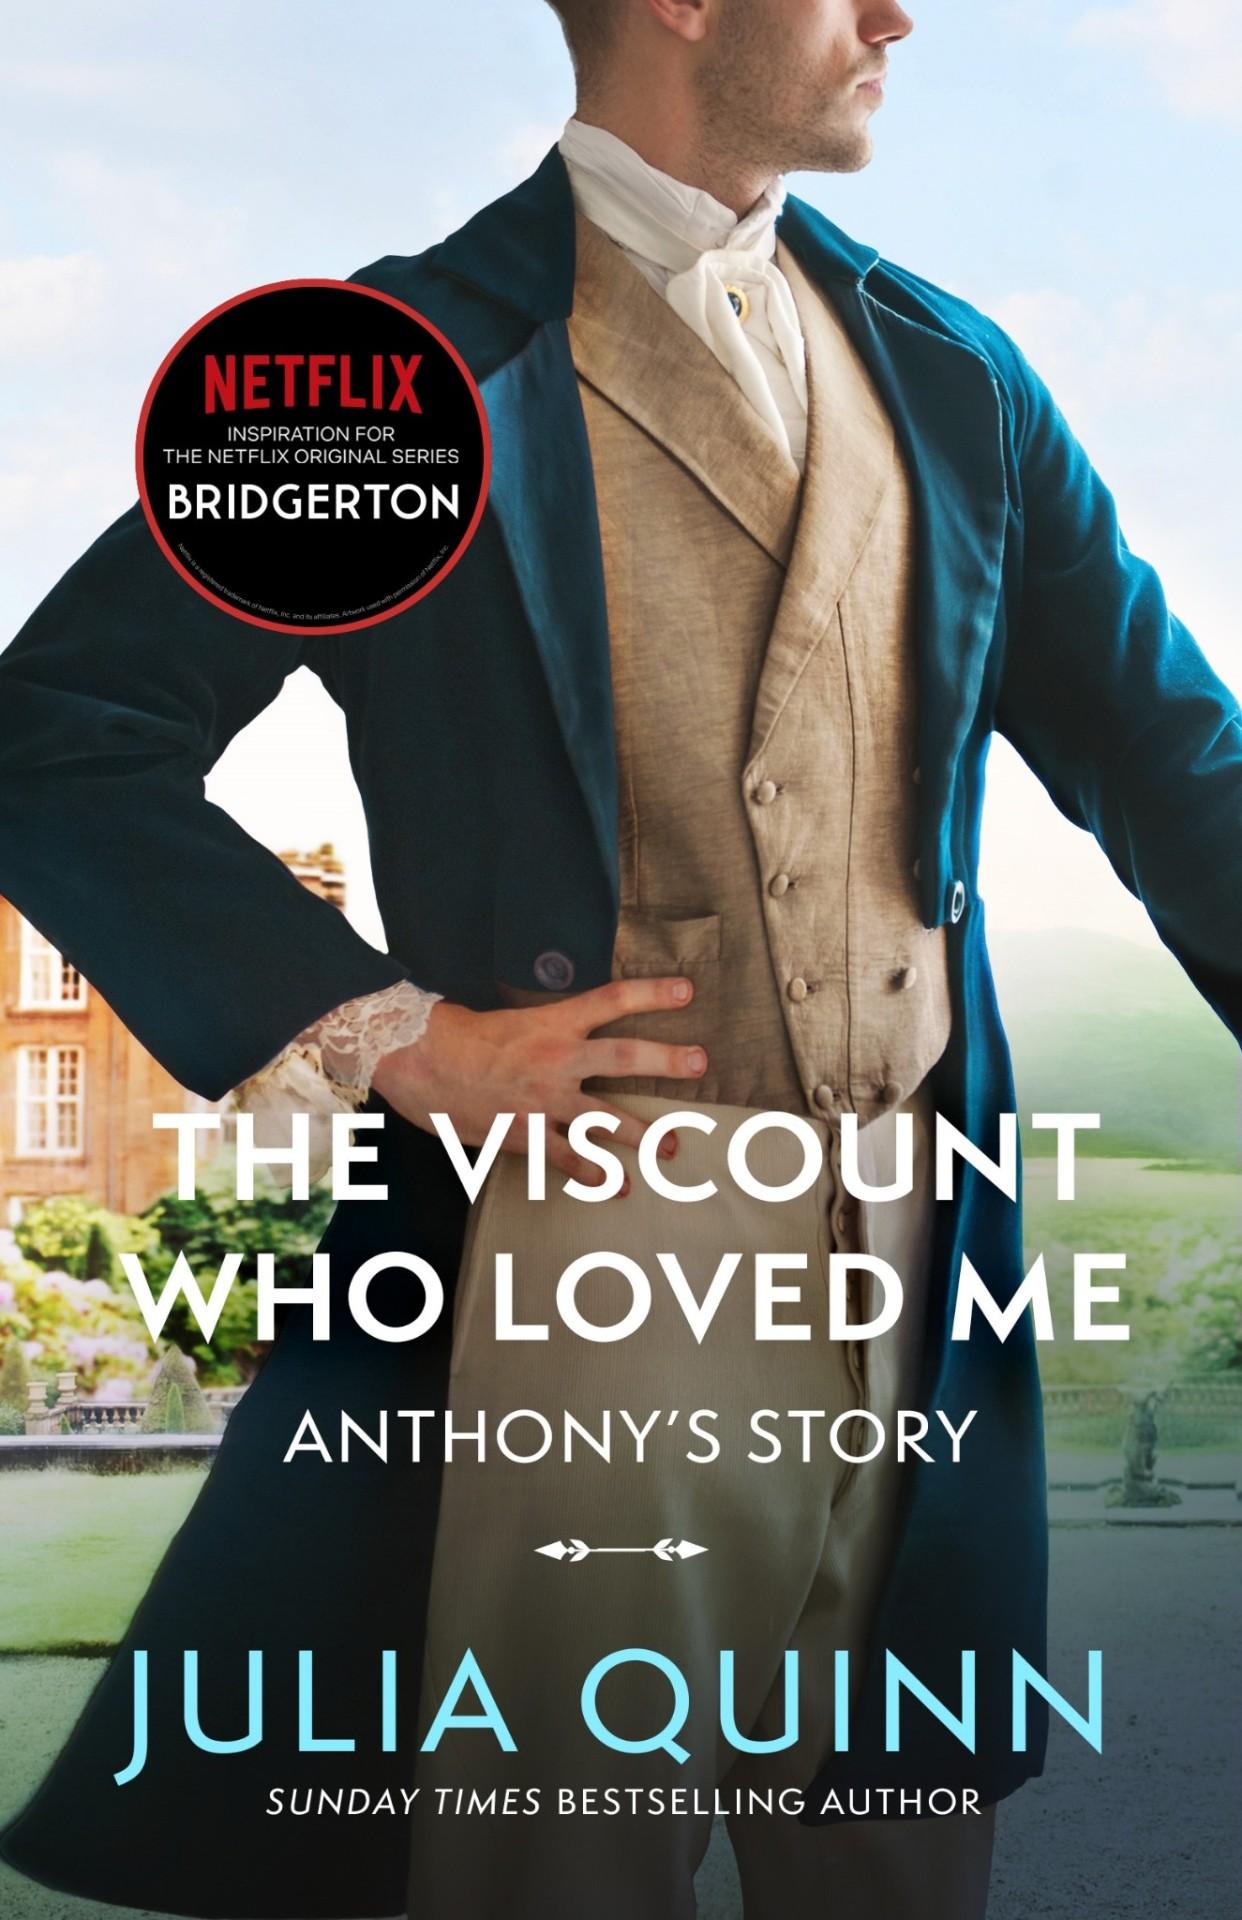 Bridgerton: The Viscount Who Loved Me (Bridgertons Book 2) - 9780349429793